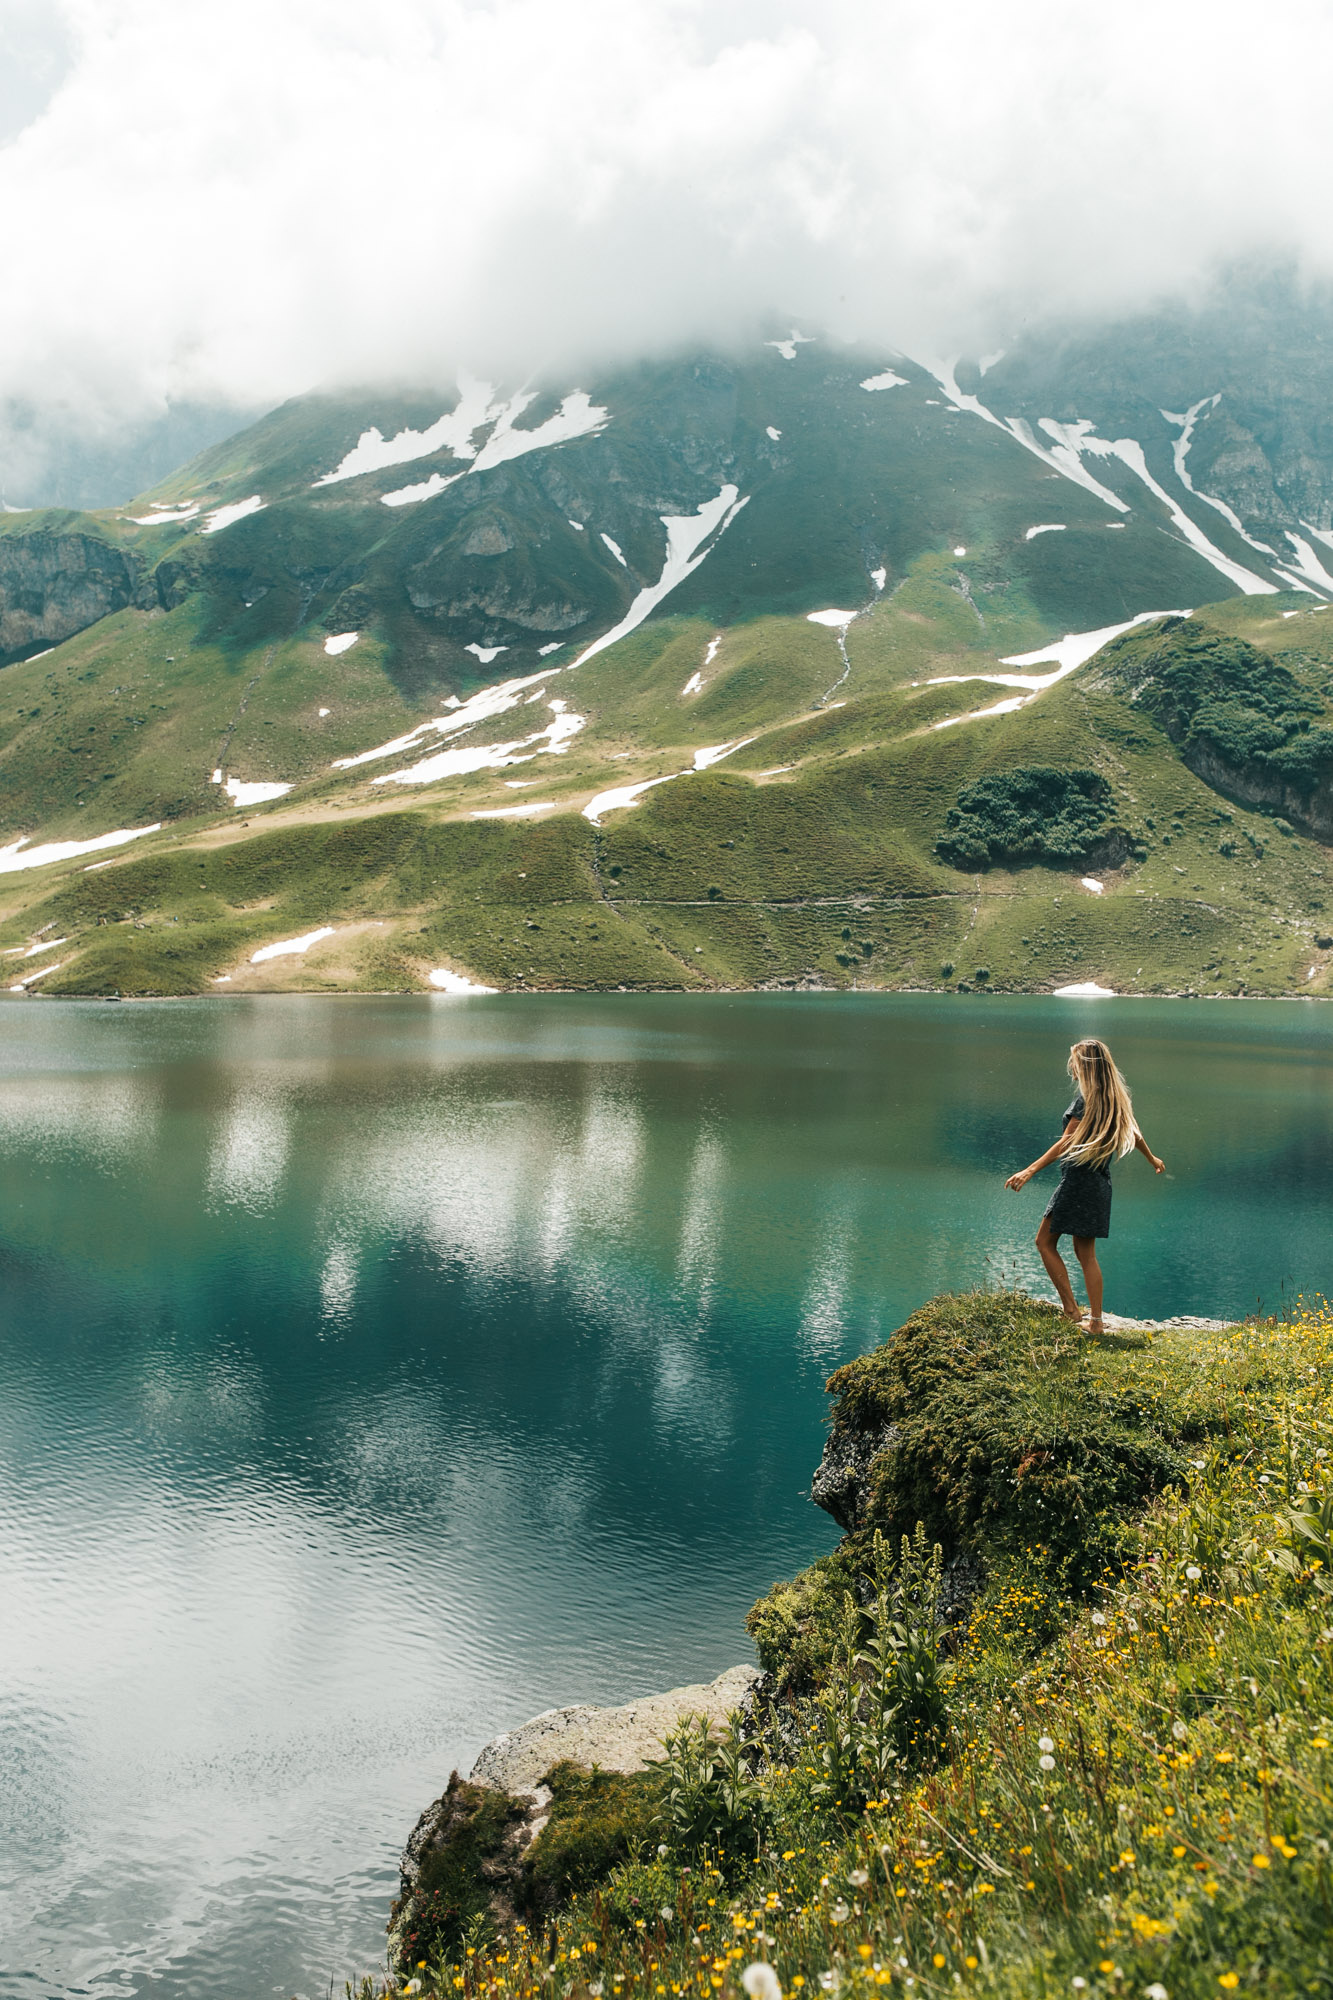 SwitzerlandBlog_HBGOODIE2018 (33 of 58).jpg